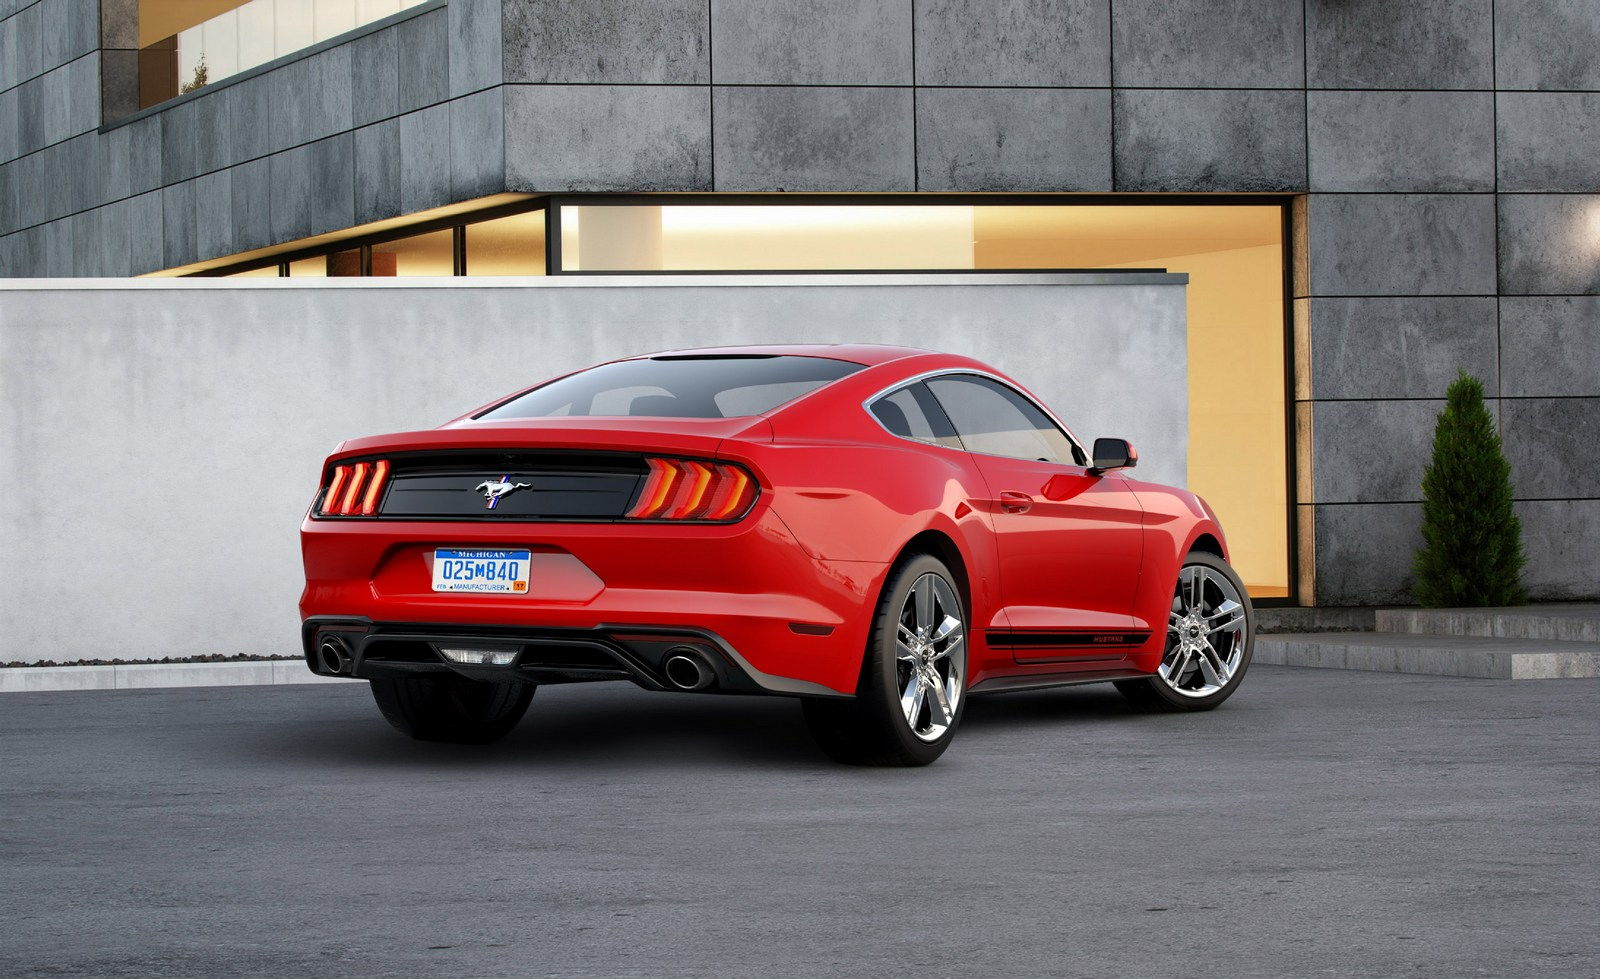 2018 Ford Mustang Pricing Starts At $25,585